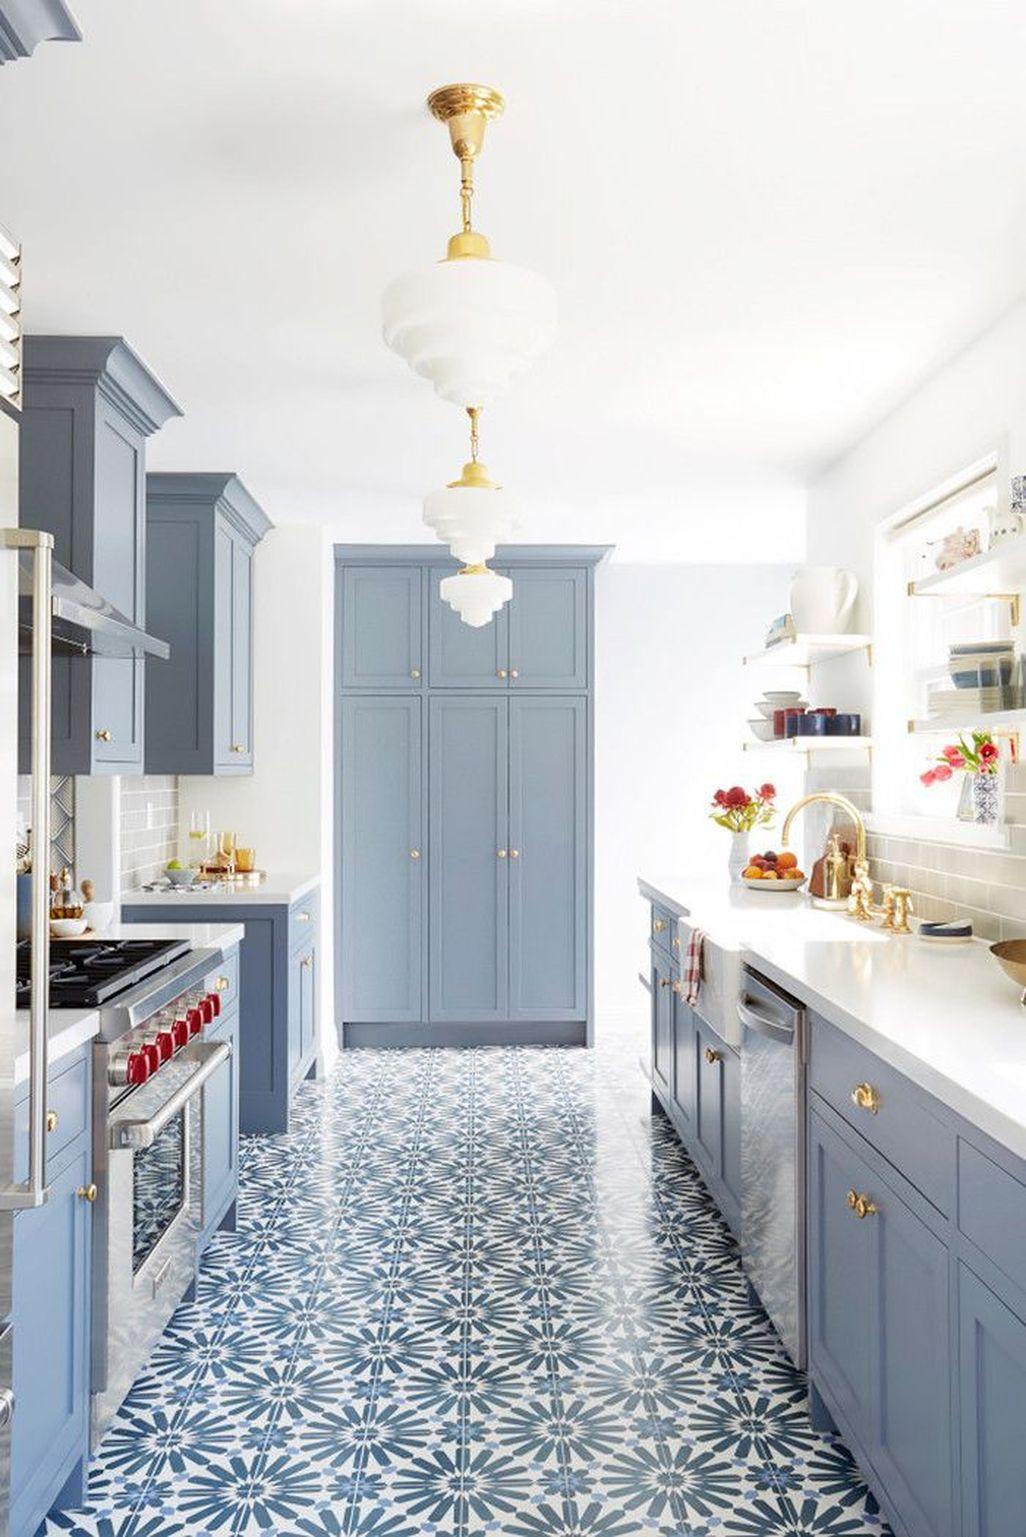 Amazing Home Kitchen Tile Design Ideas 2018 32